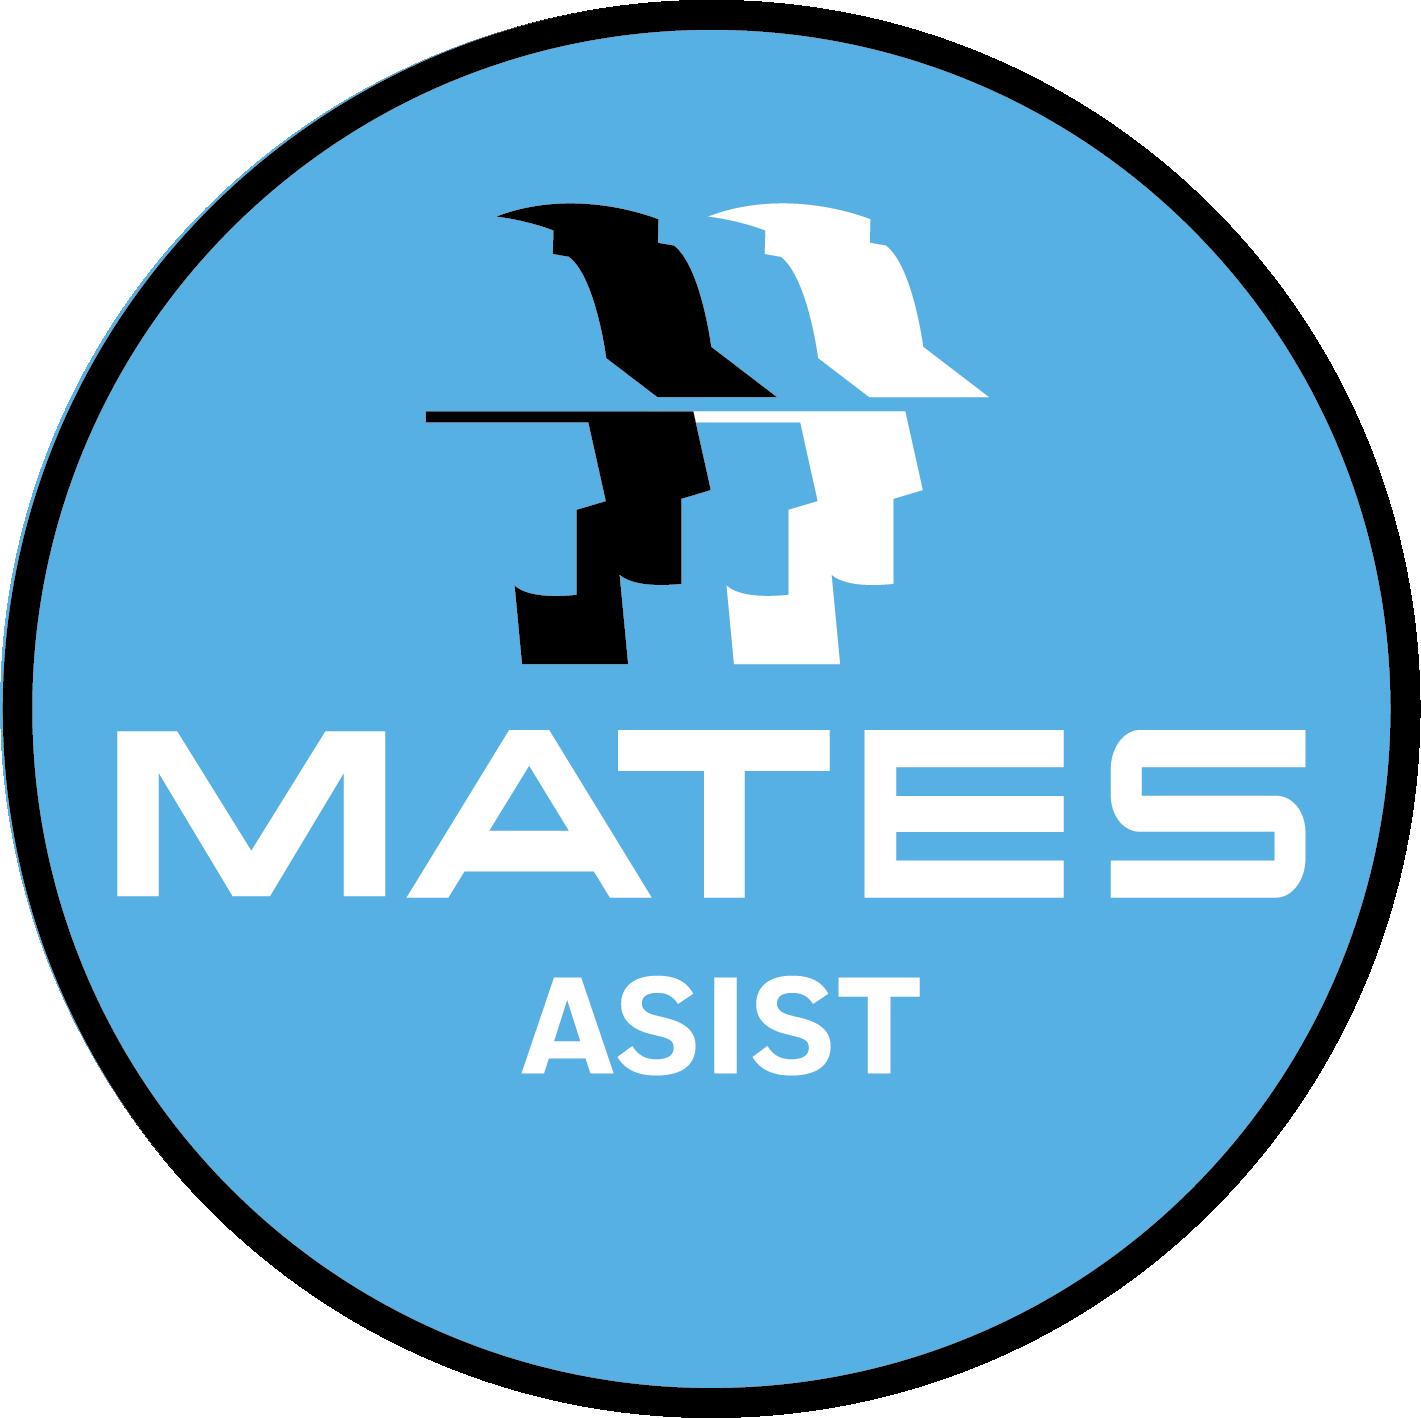 MATES Asist | MATES in Construction NZ